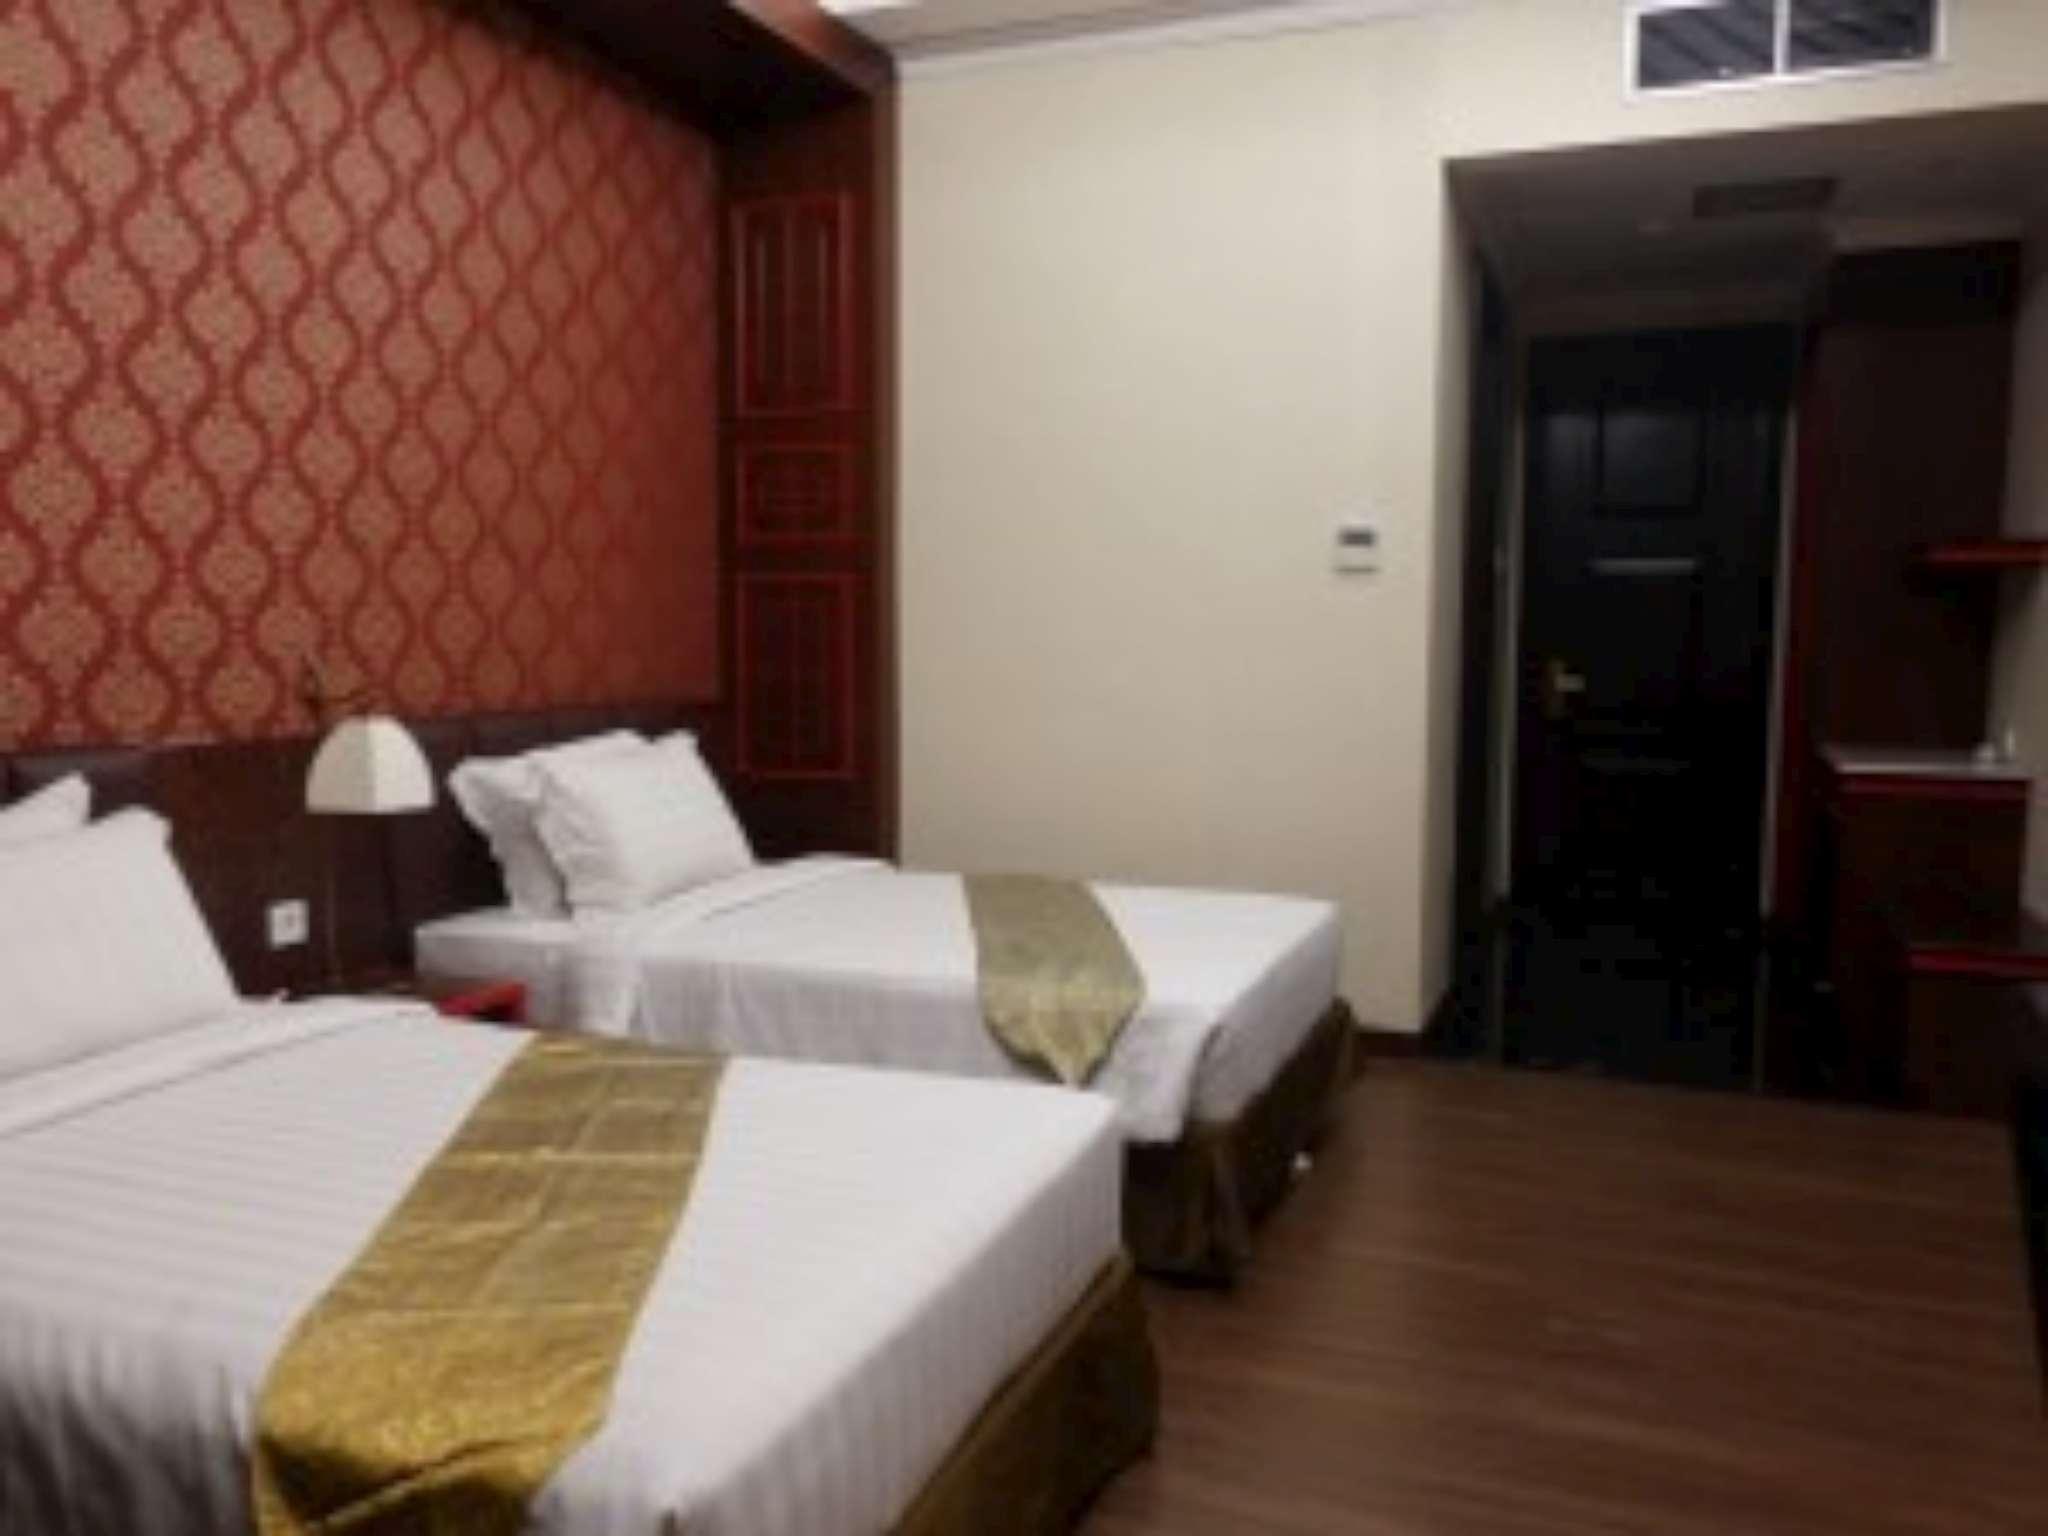 Hotel The Grantage Hotel & Sky Lounge - Jalan BSD Boulevard Utara - Tangerang